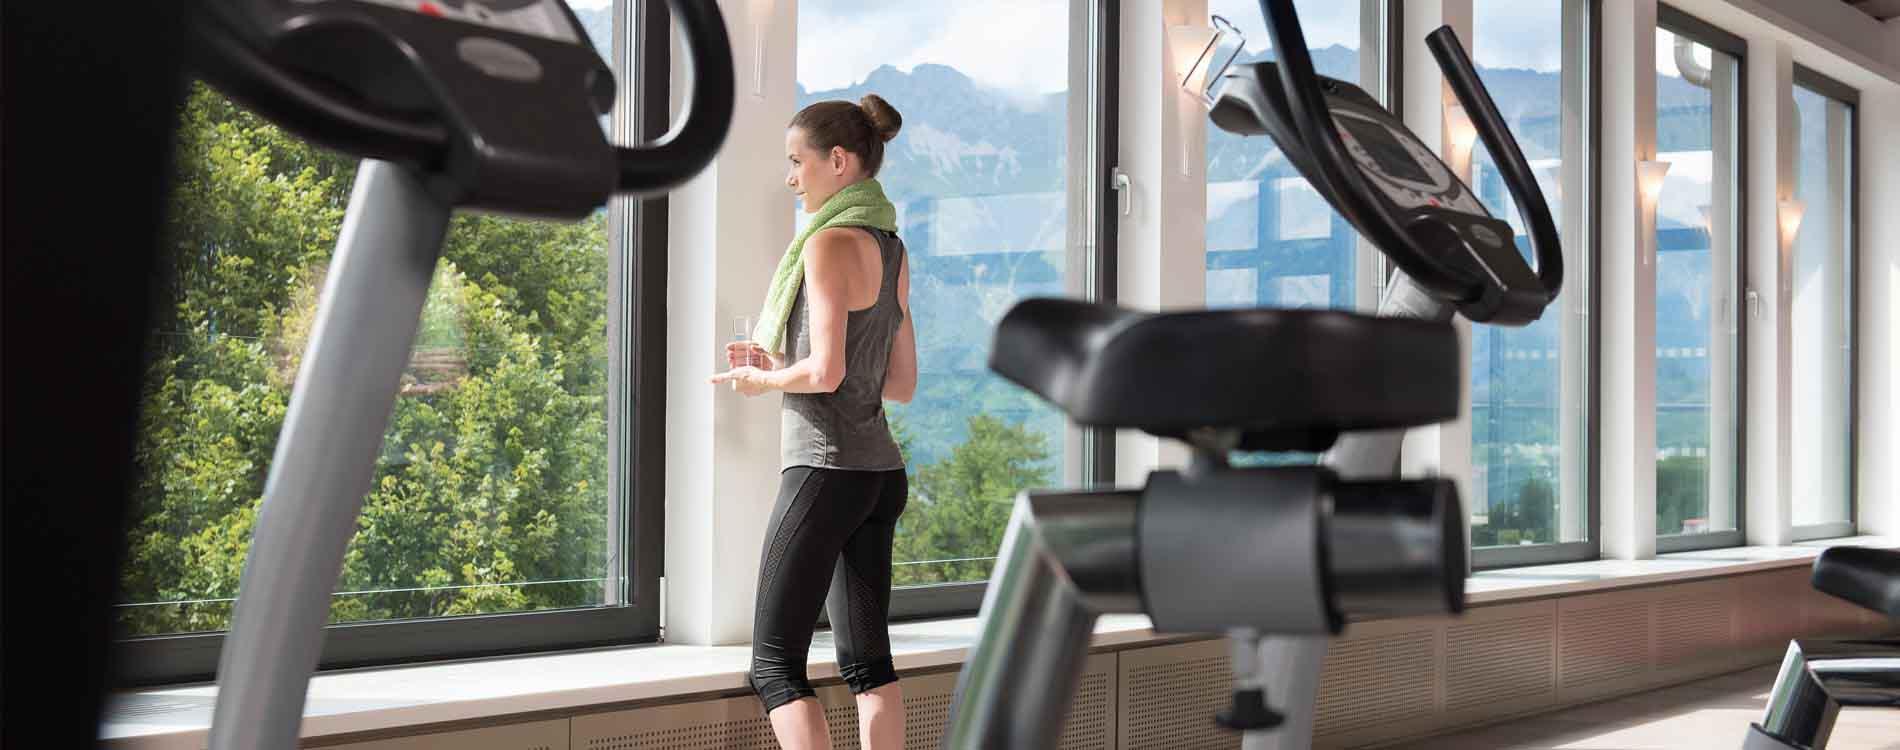 Niche Destinations Detox on the Run Park Igls Mayr Clinic Innsbruck Tyrol Austria Detox Holidays